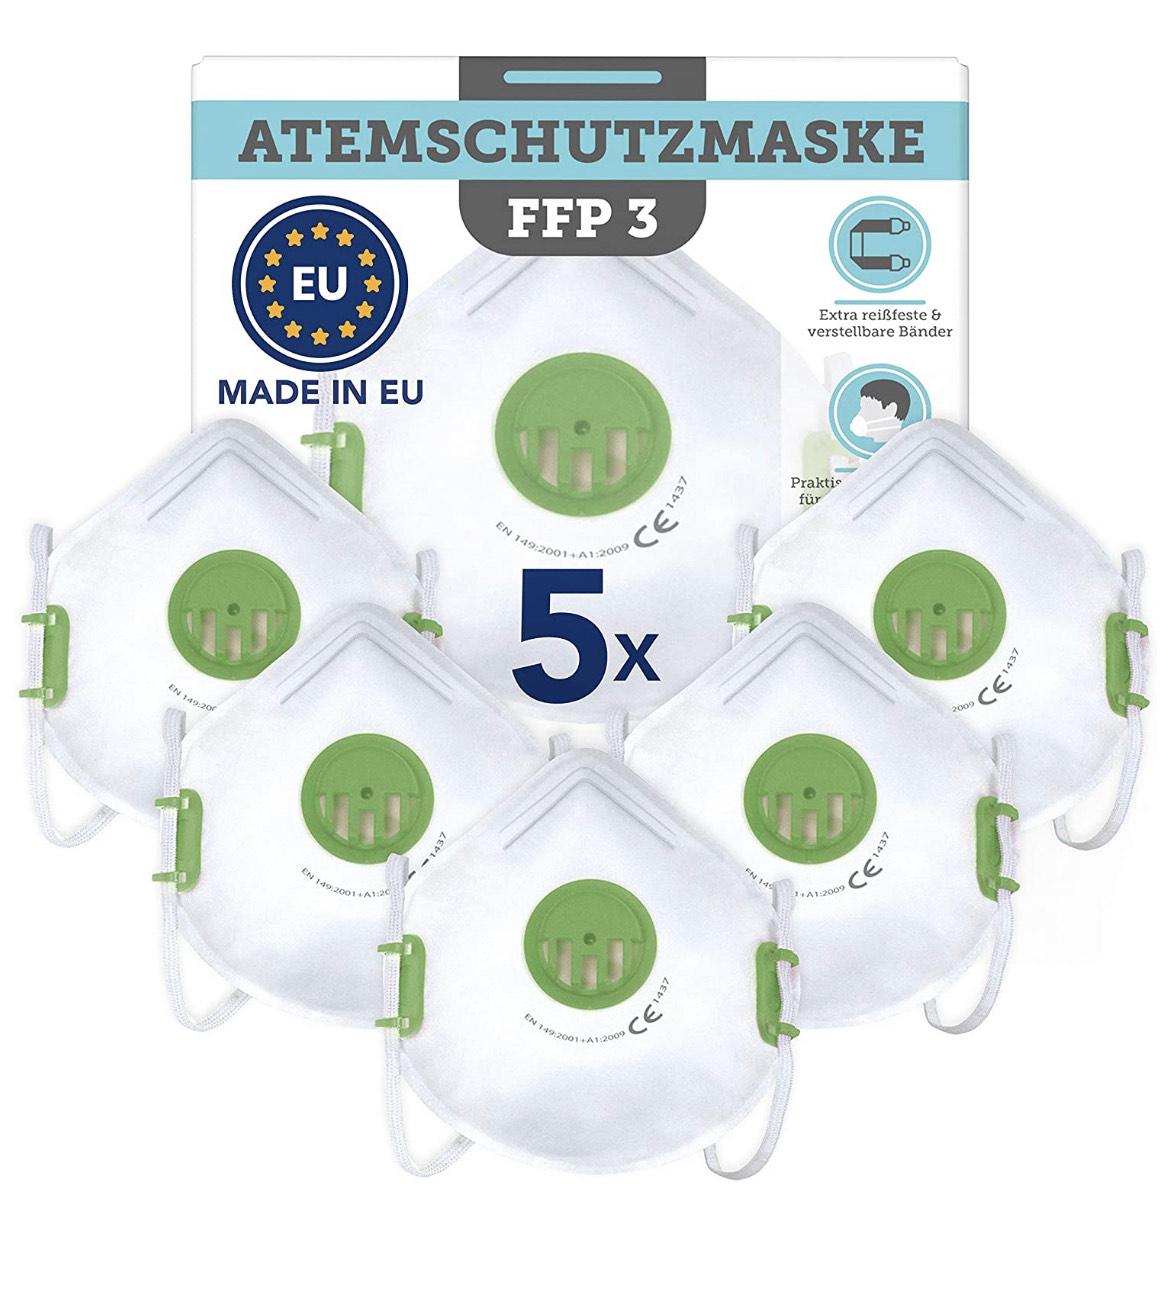 5x FFP3 CE-zertifizierte Masken – Made in EU[Amazon]